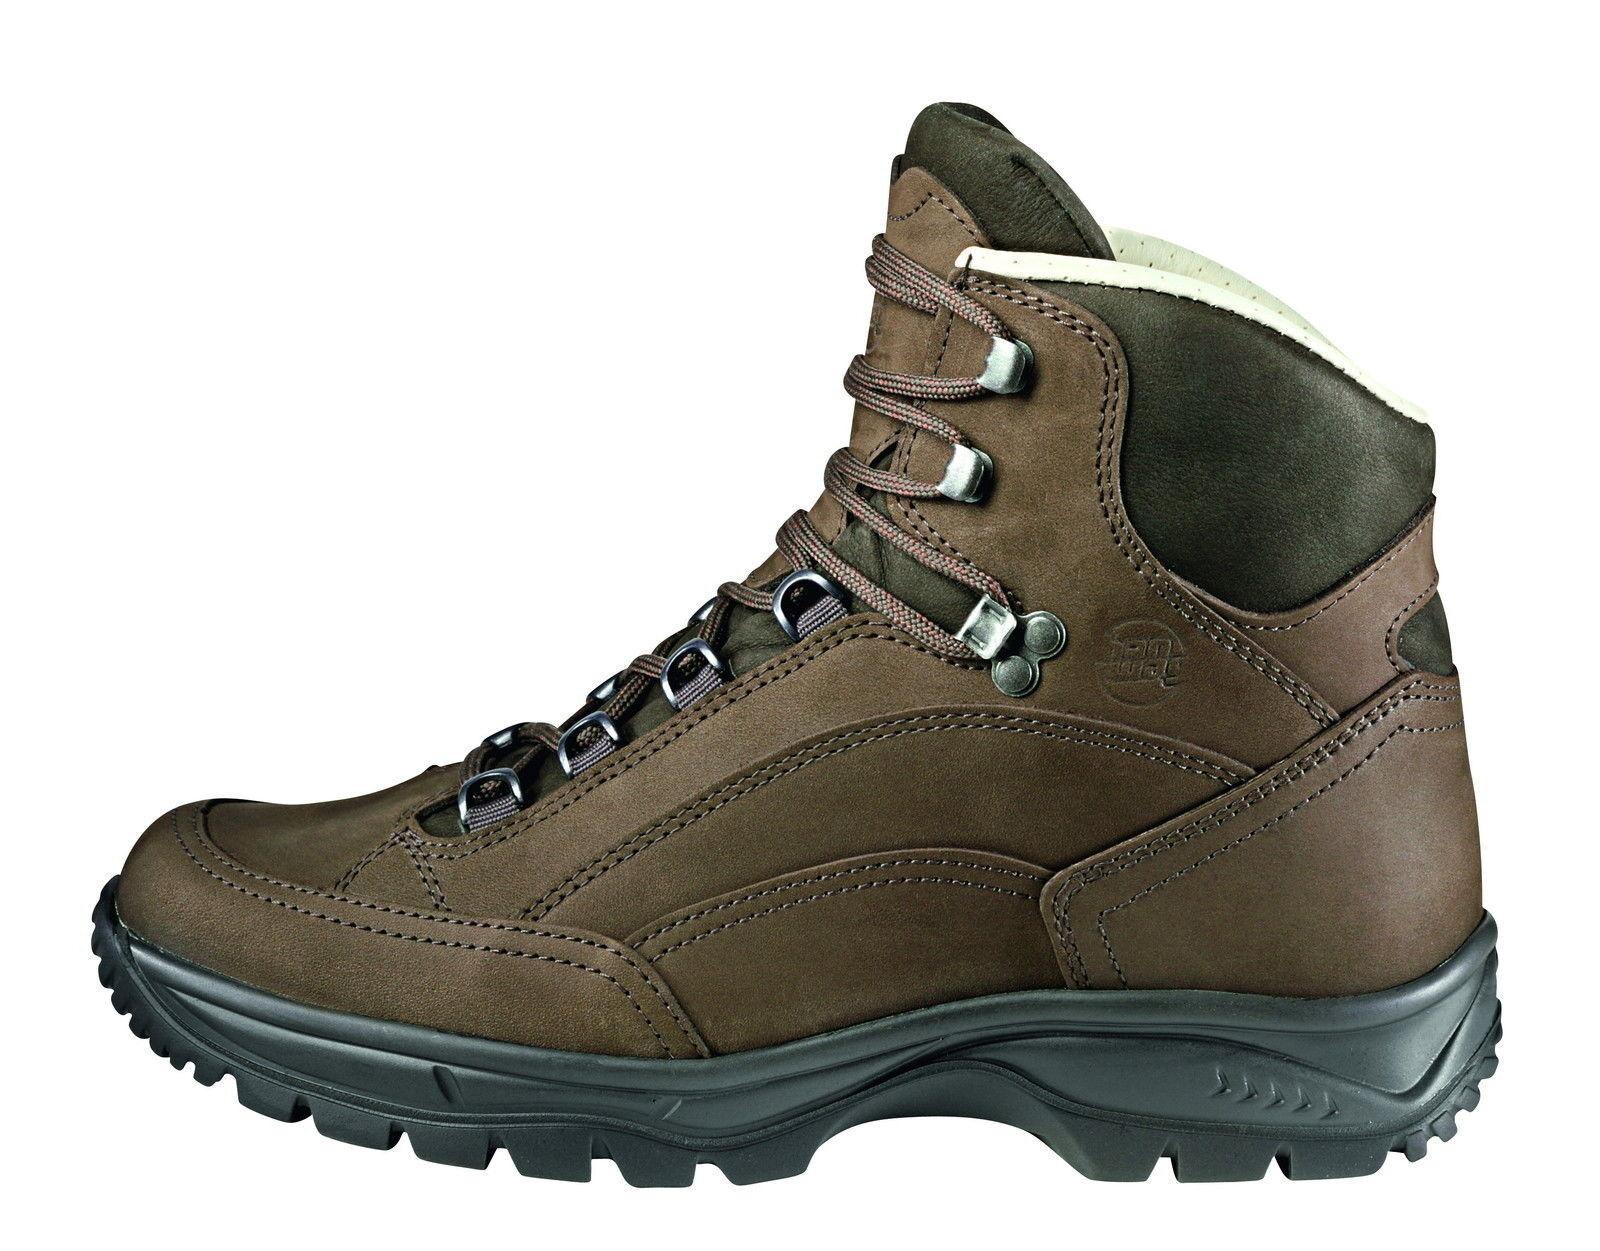 Hanwag Zapatos de Montaña Canyon Men II, Piel, Tierra Tamaño 10-44,5